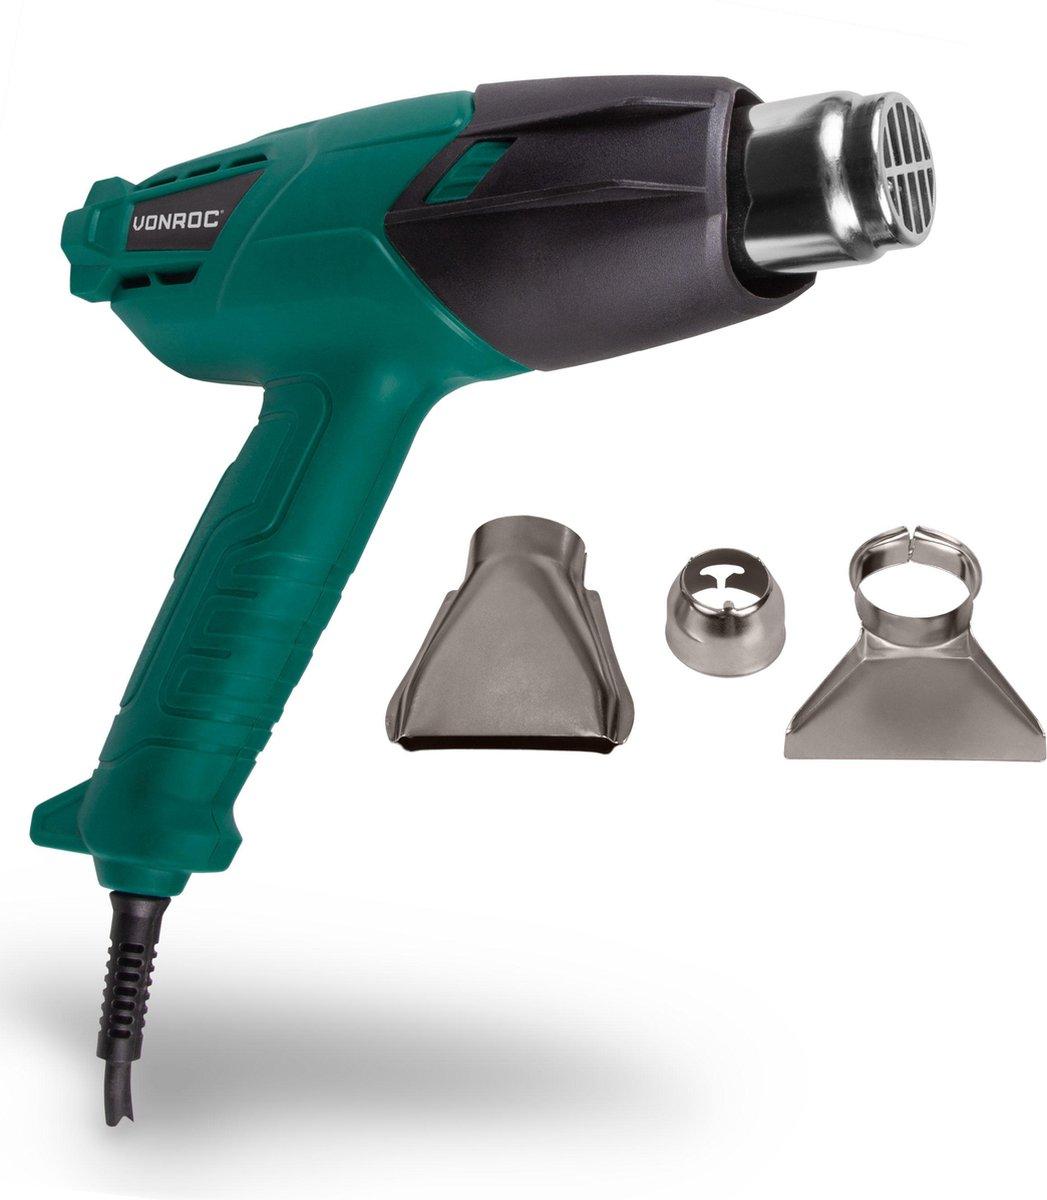 VONROC Heteluchtpistool   Verfafbrander   2000W   2 temperatuurstanden   Incl. Accessoires & tas